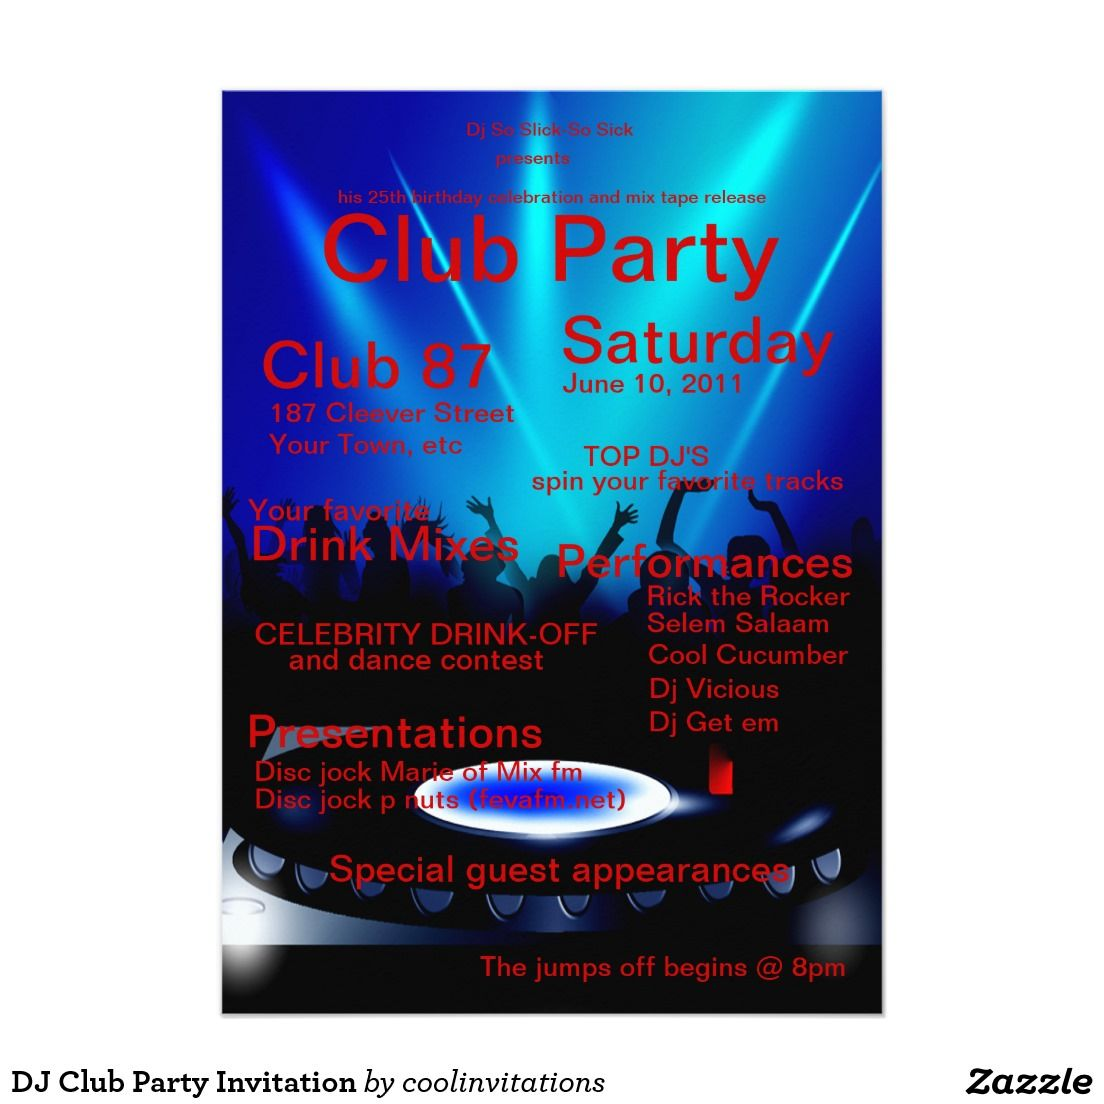 dj club party invitation dj party invitations pinterest party